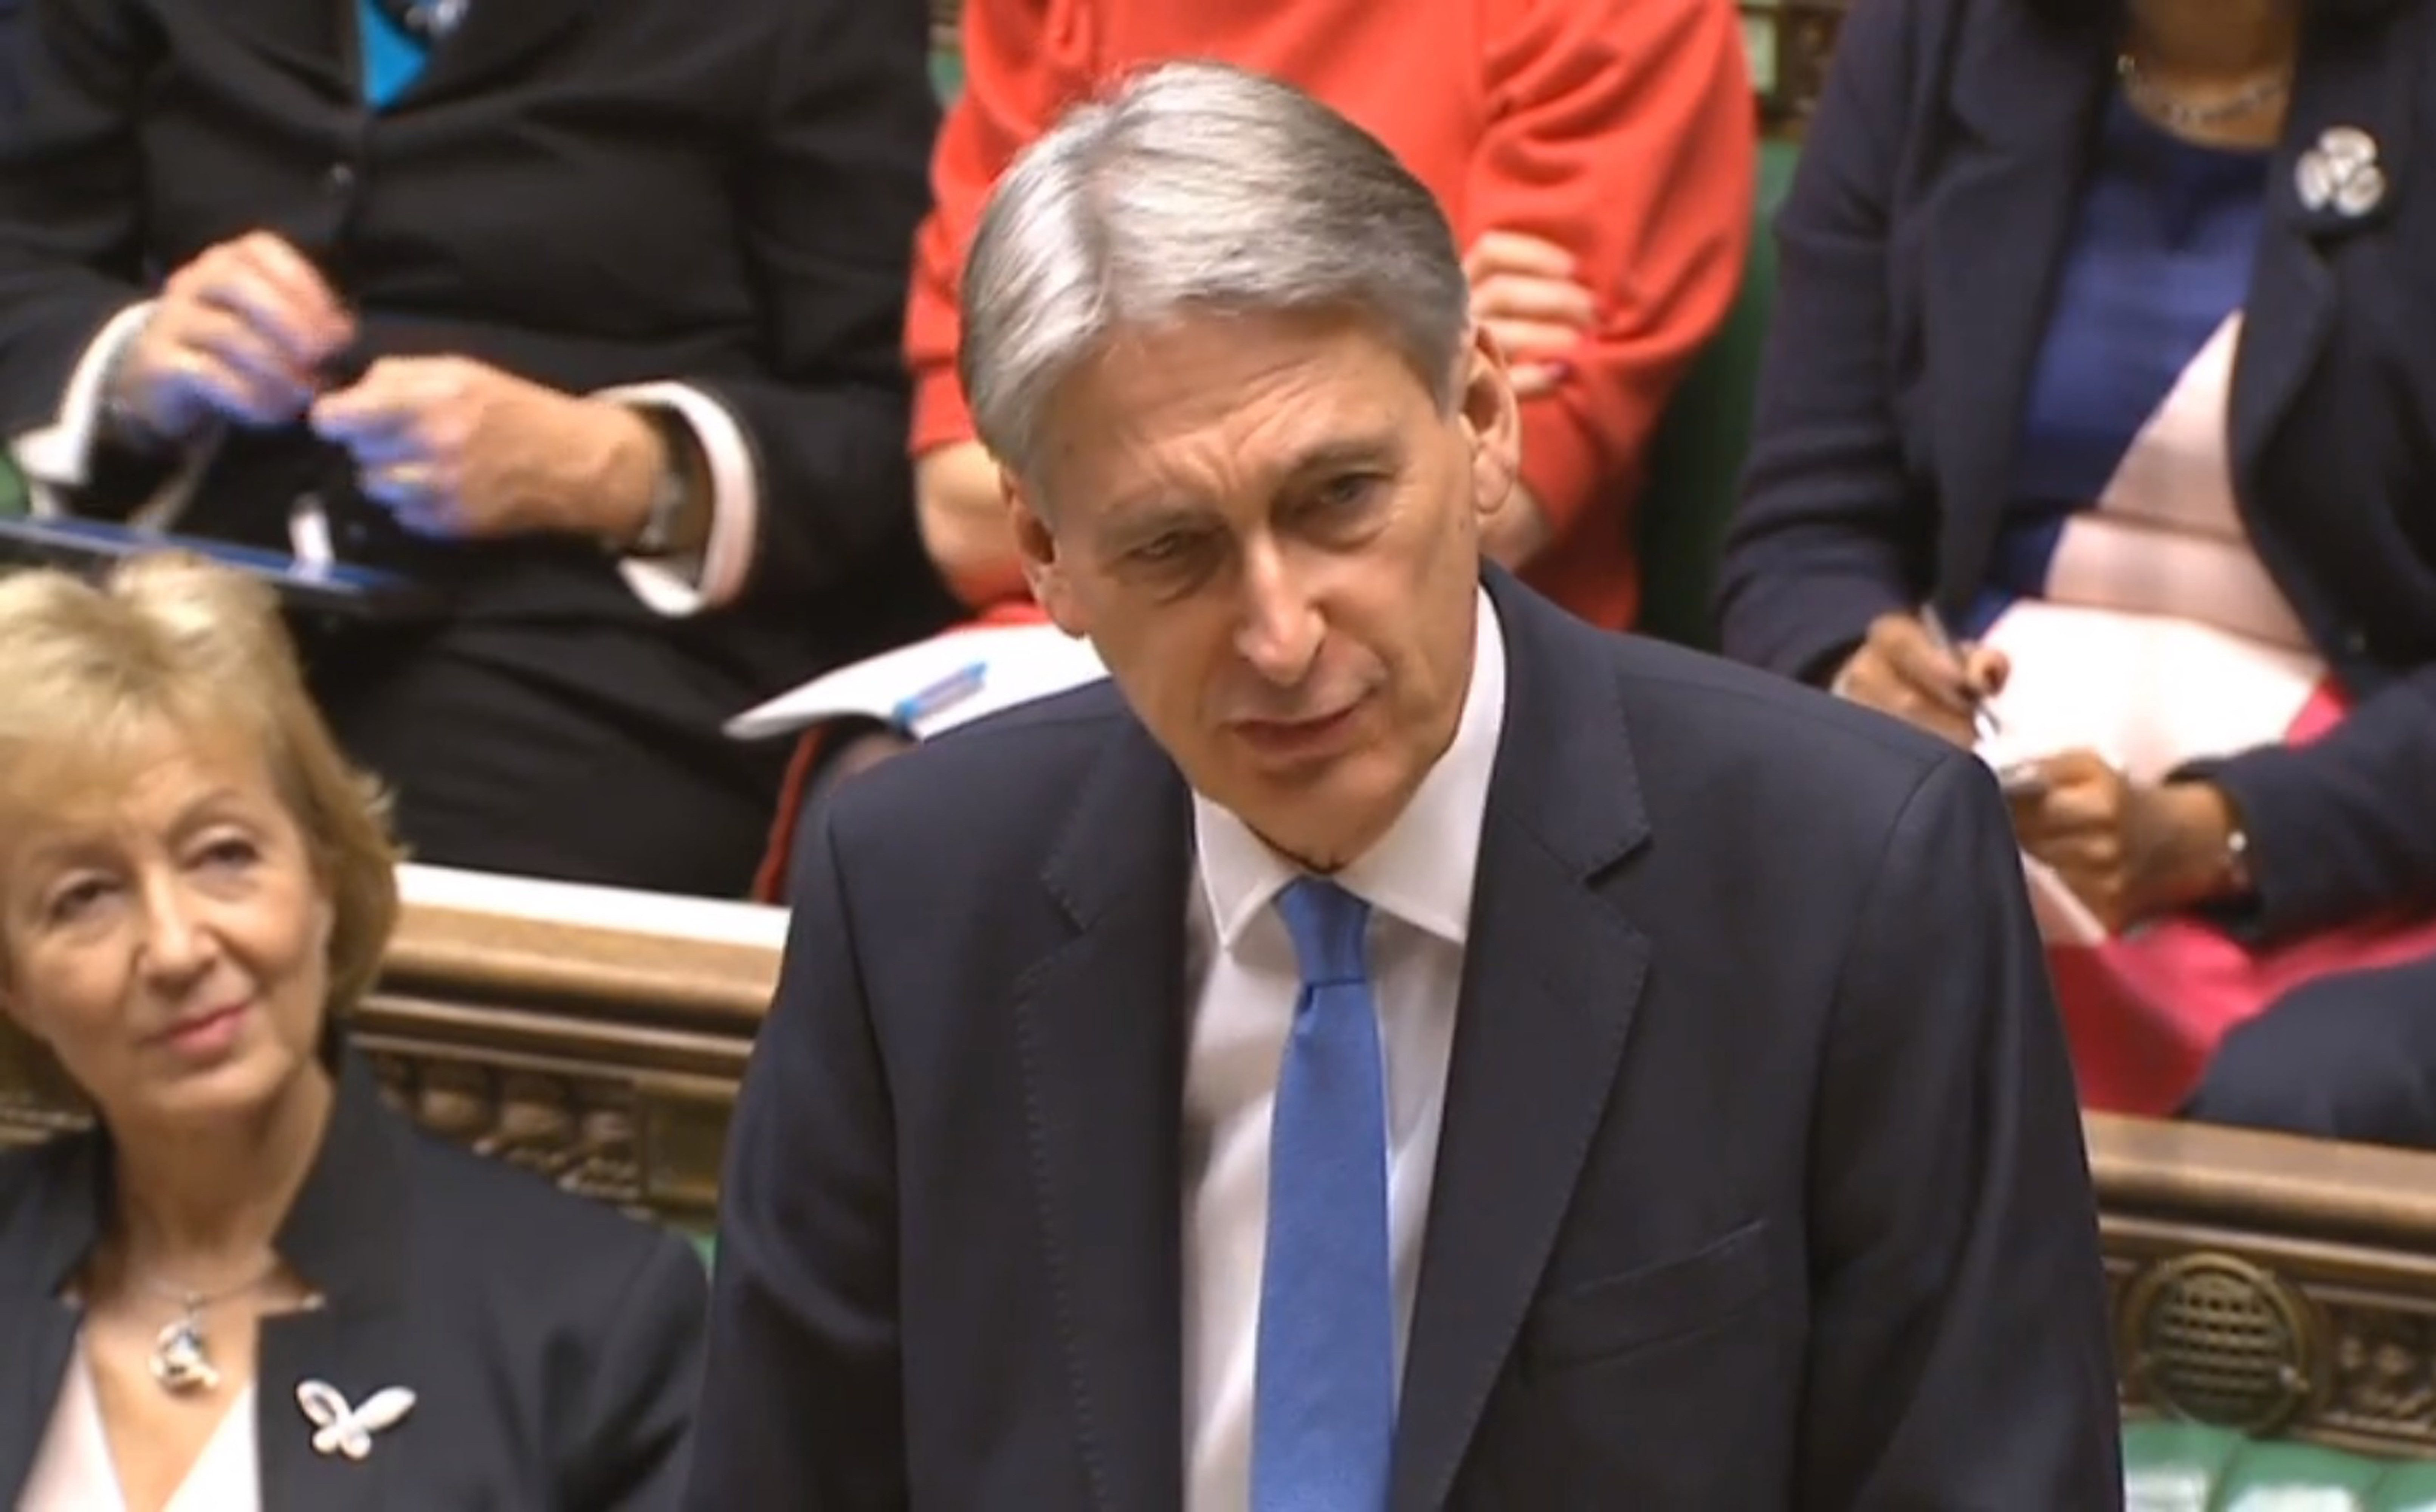 Budget 2017: Chancellor Reveals Grim Growth Forecasts Amid Climbdown On Universal